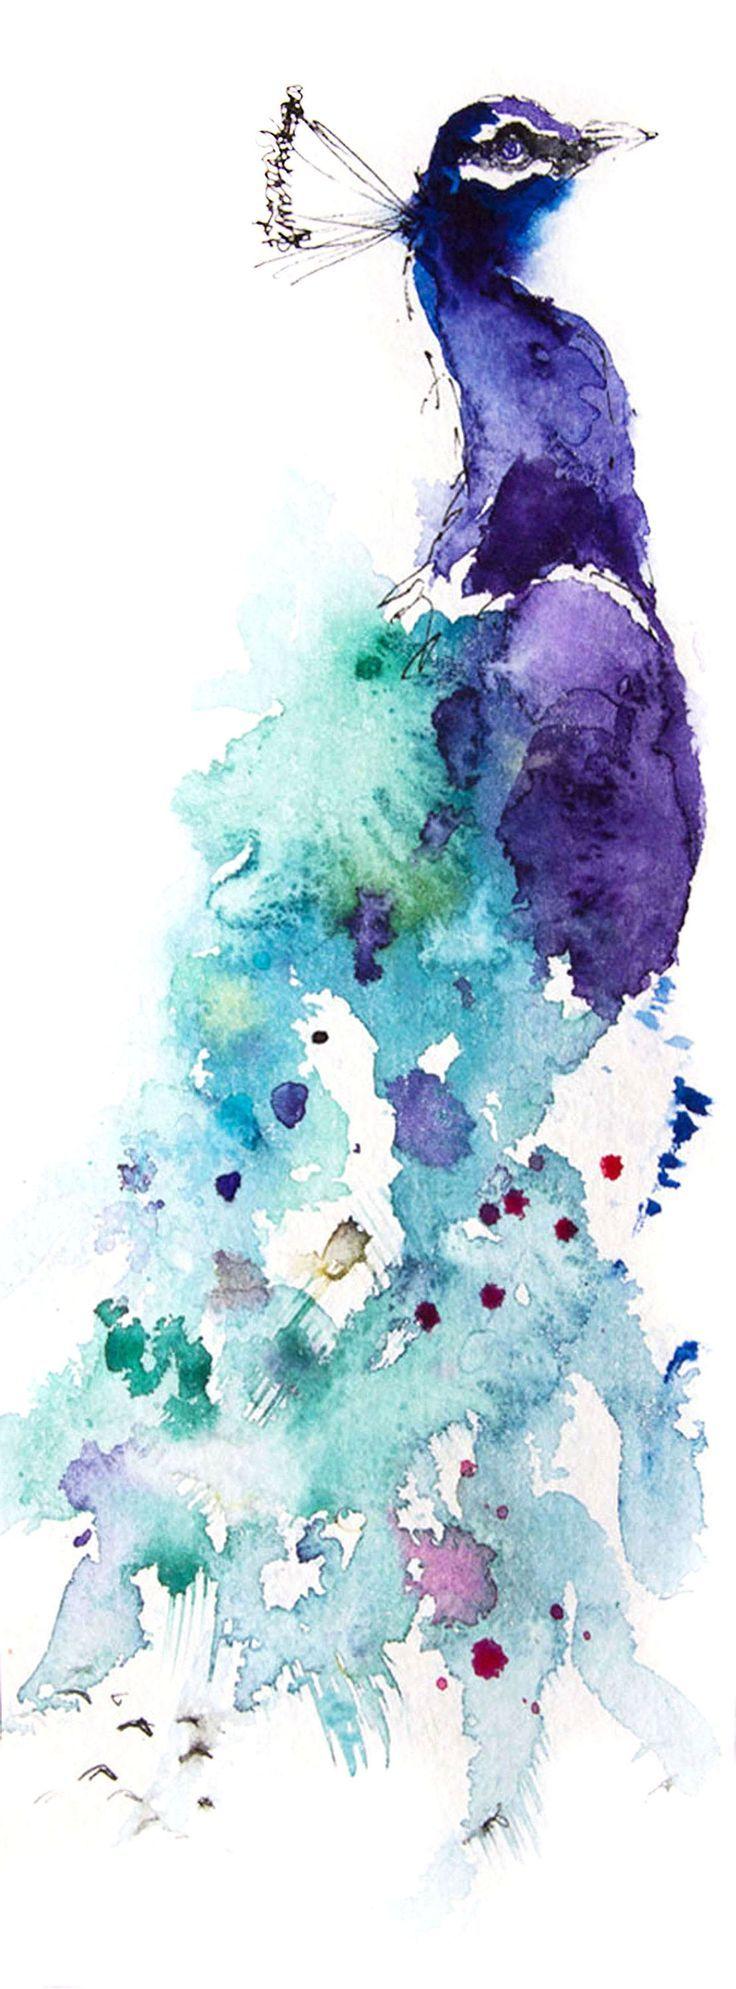 PFAU Original Kunst Aquarell PRINT, Original Kunstdruck, Wohnkultur Kunst, Kinderzimmer Kunst, Vogel Kunstdruck, Illustration, Tierkunst